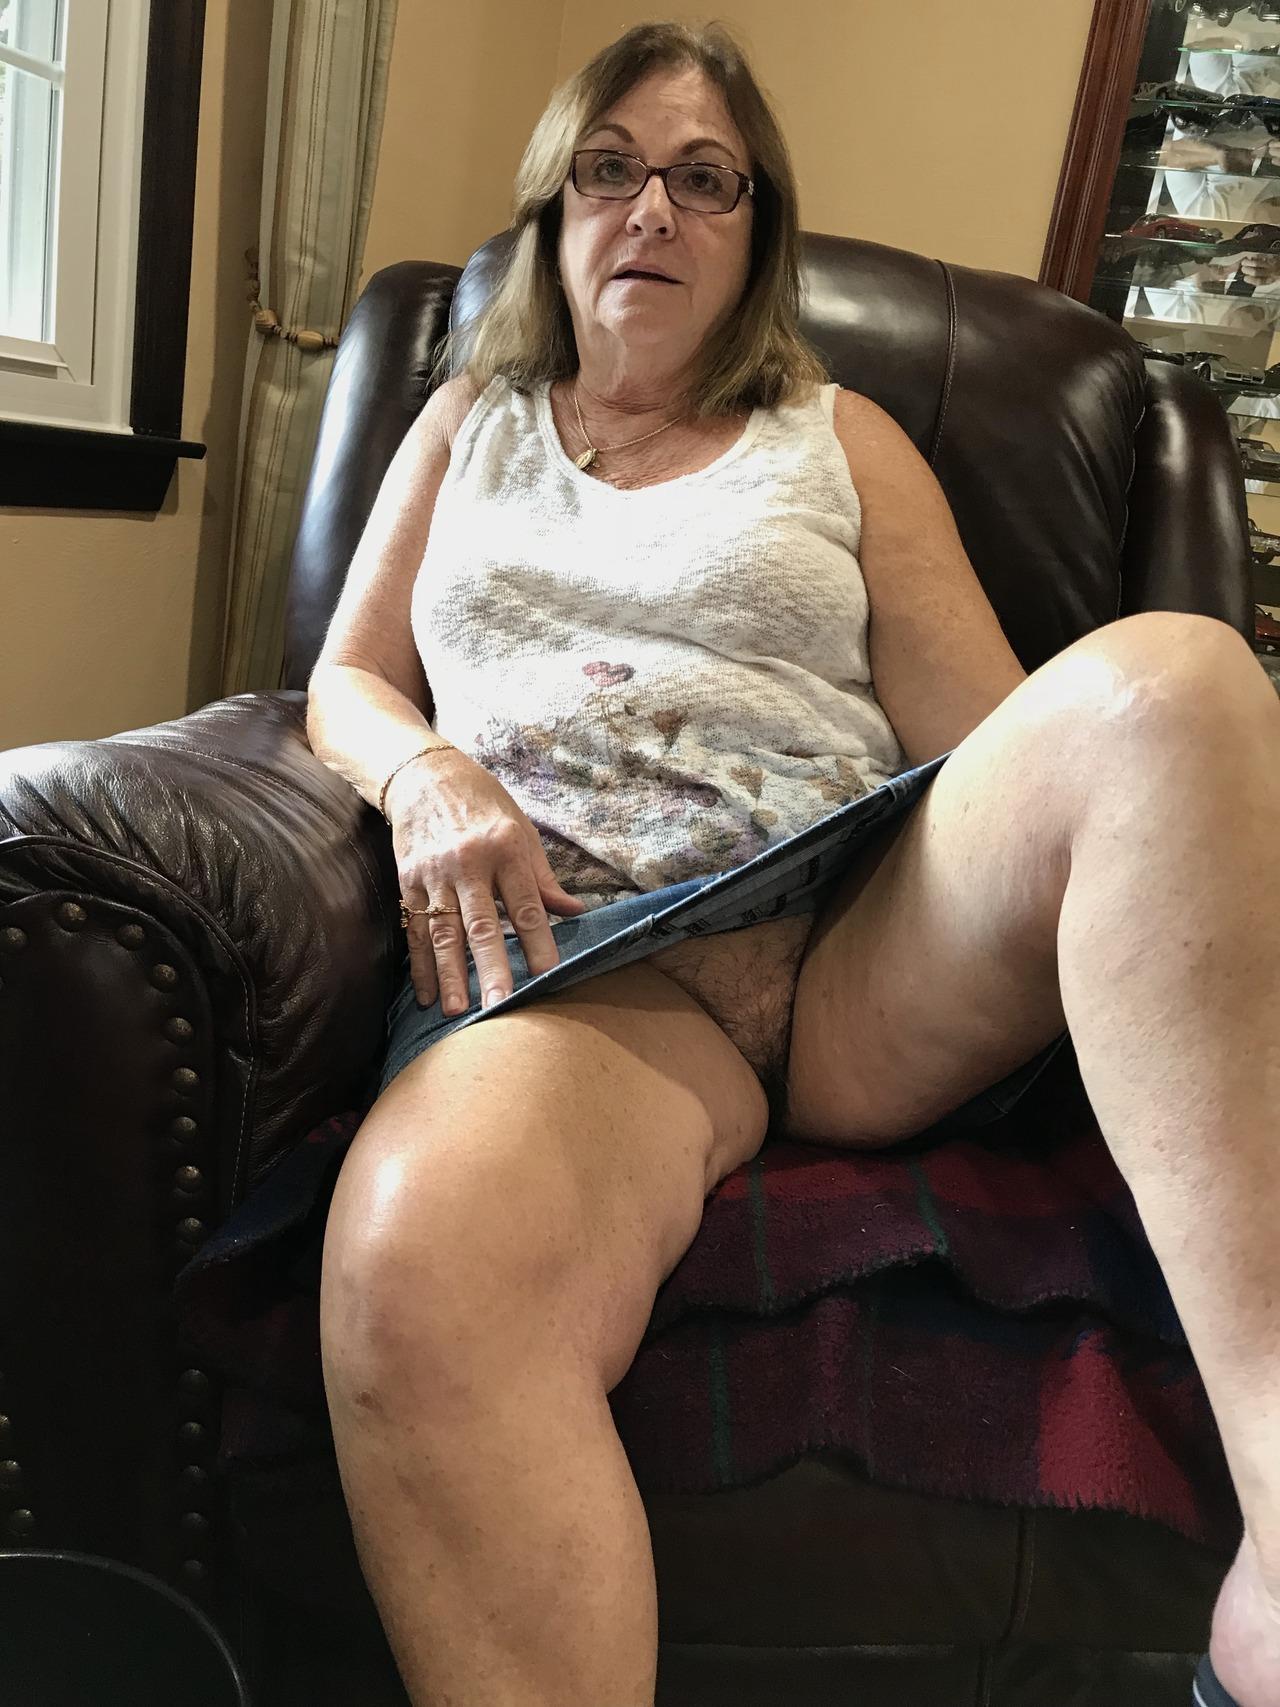 Old lady no panties